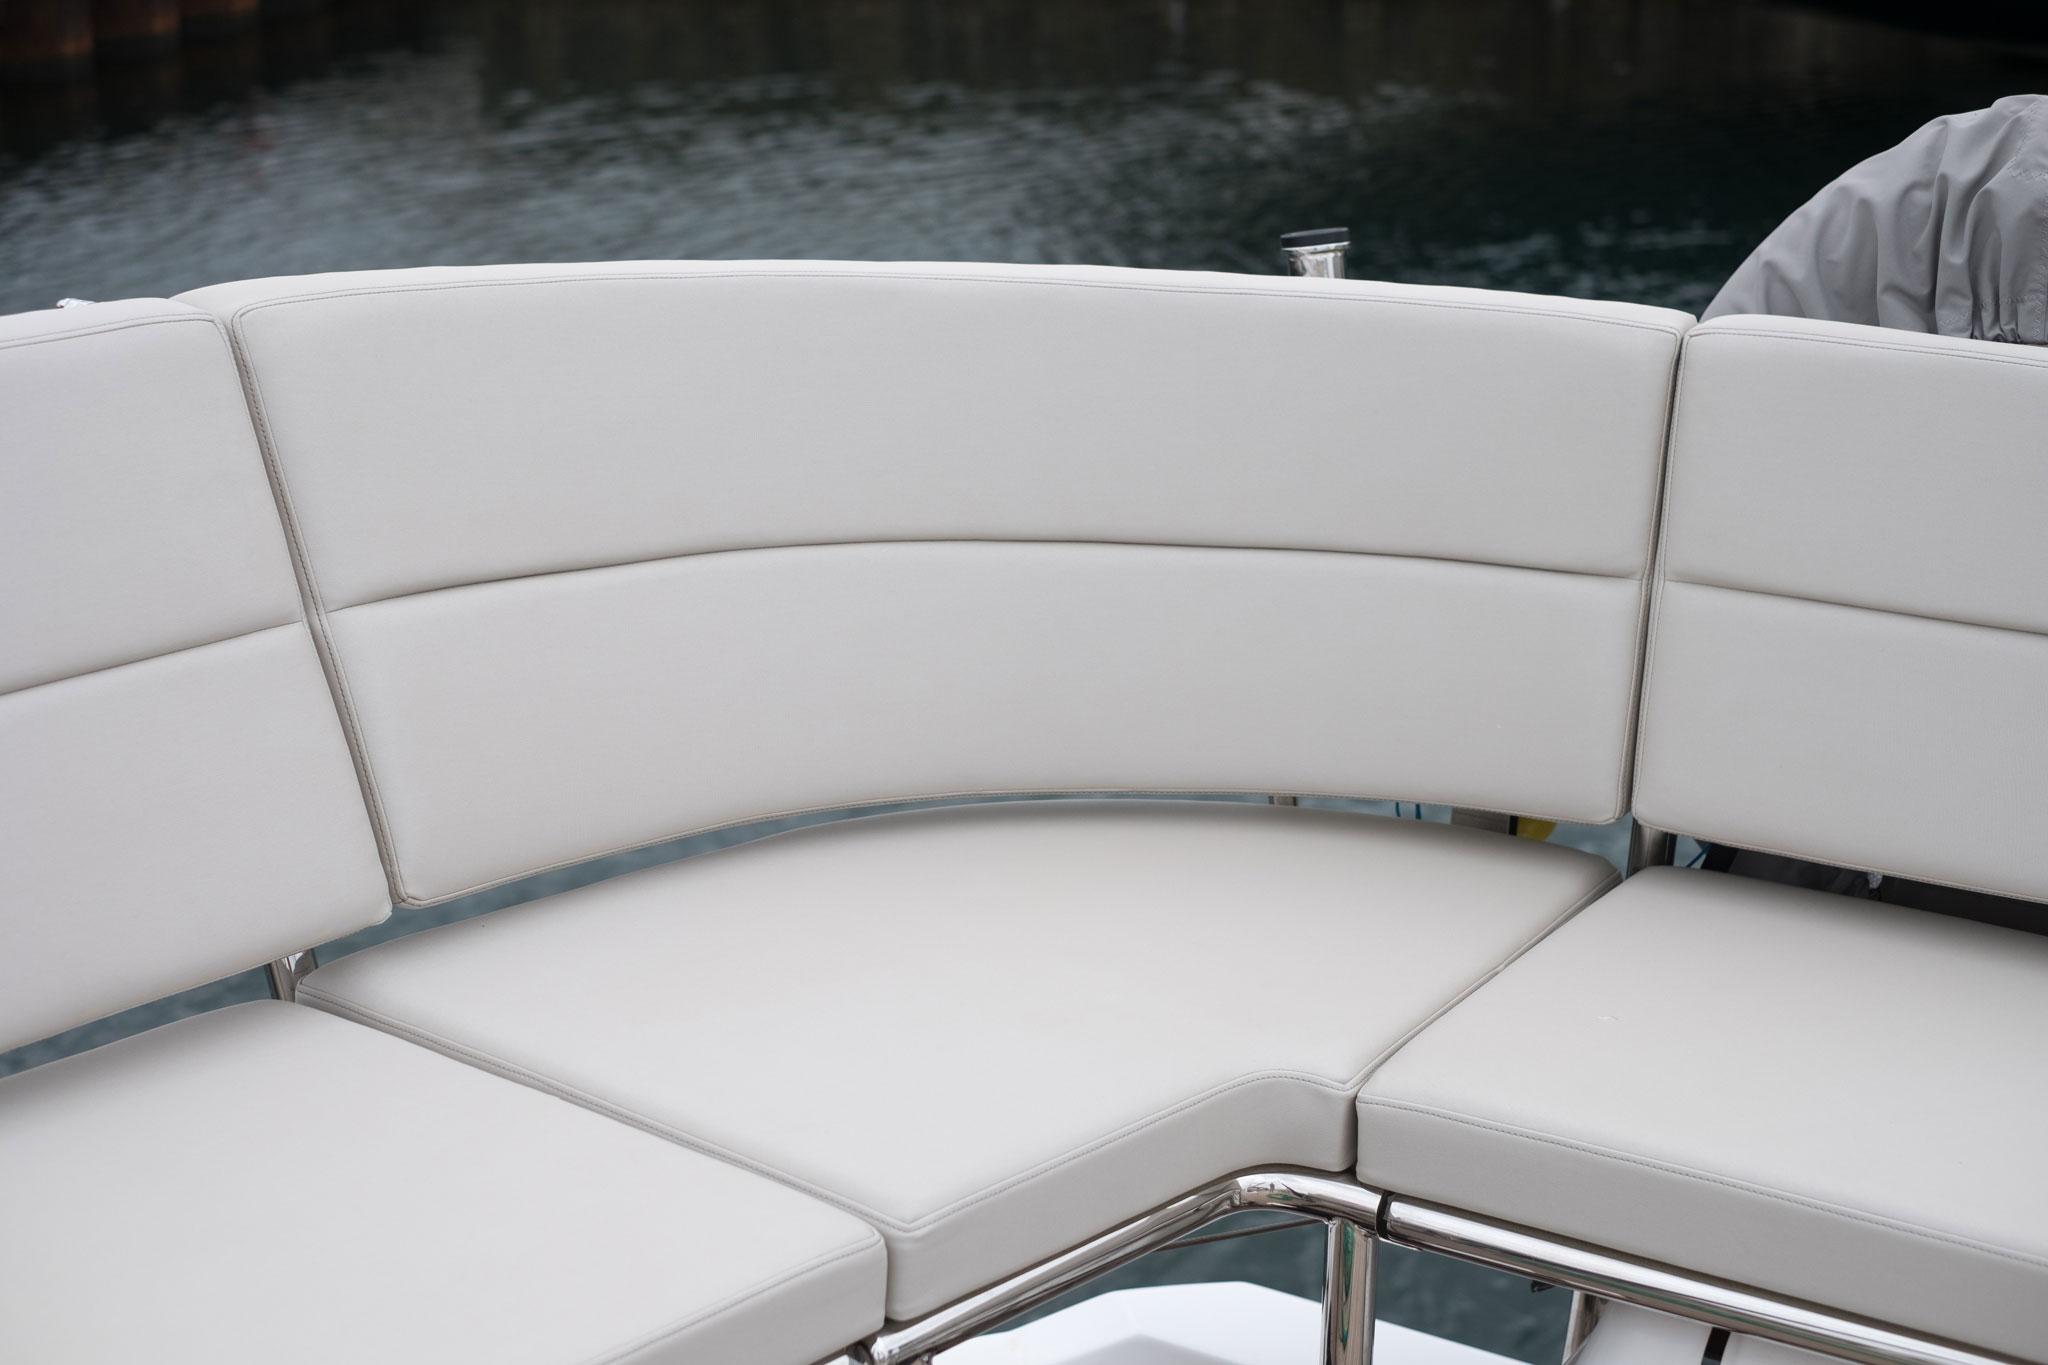 Yacht Deck Cushions Corner Detail